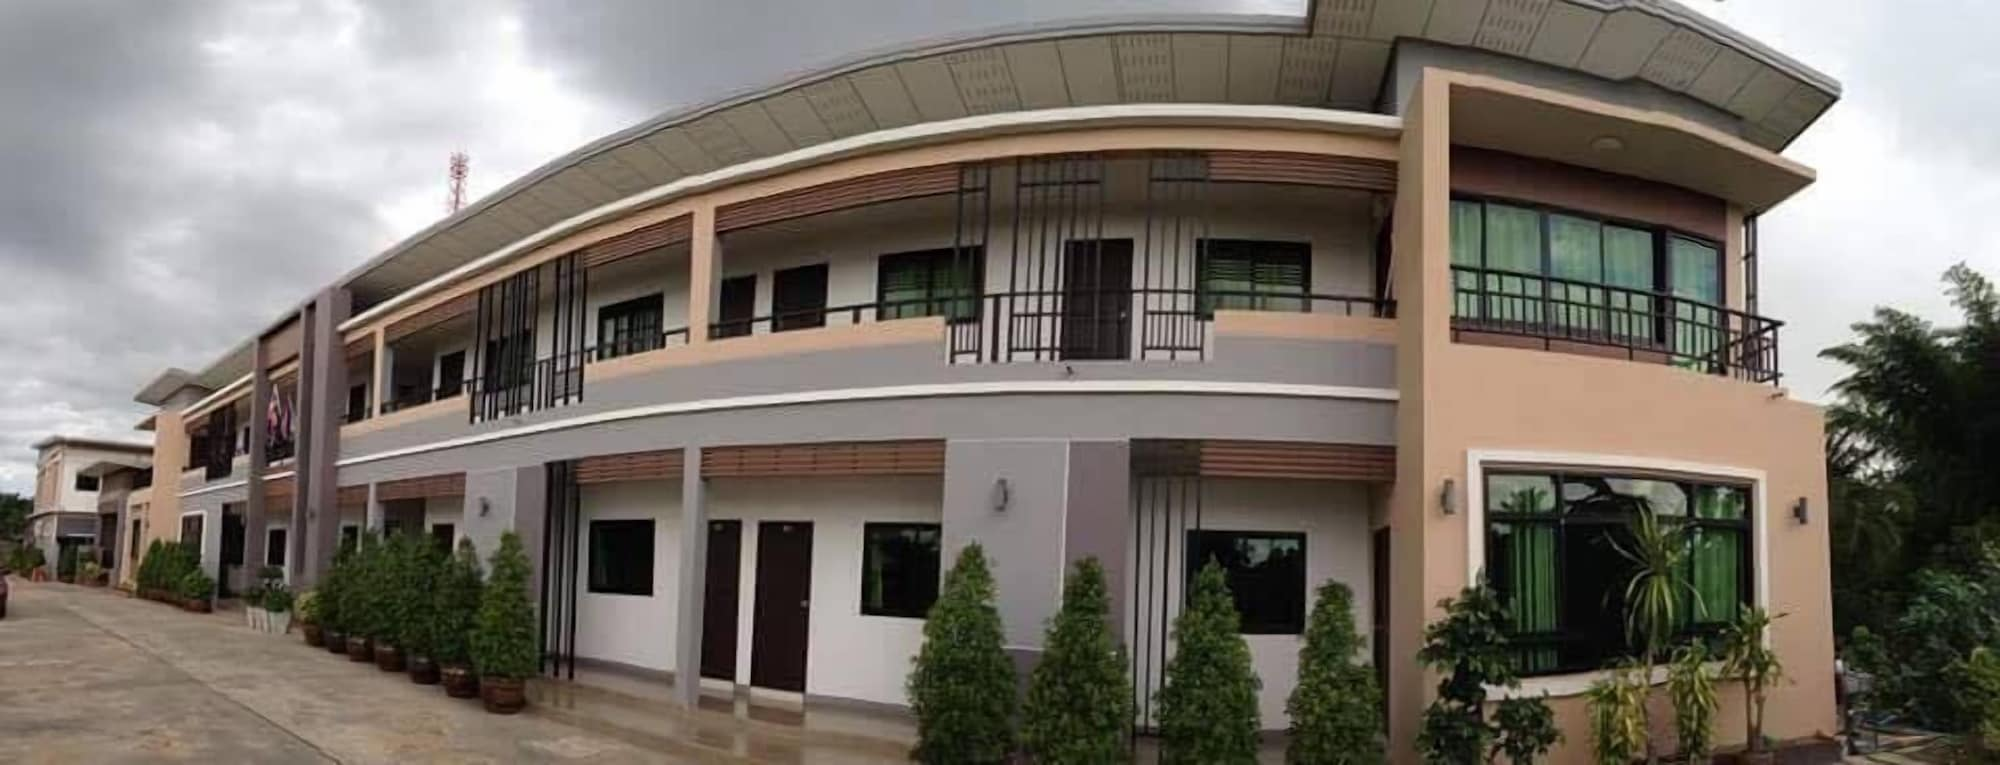 Athomepakham Hotel, Pa Kham